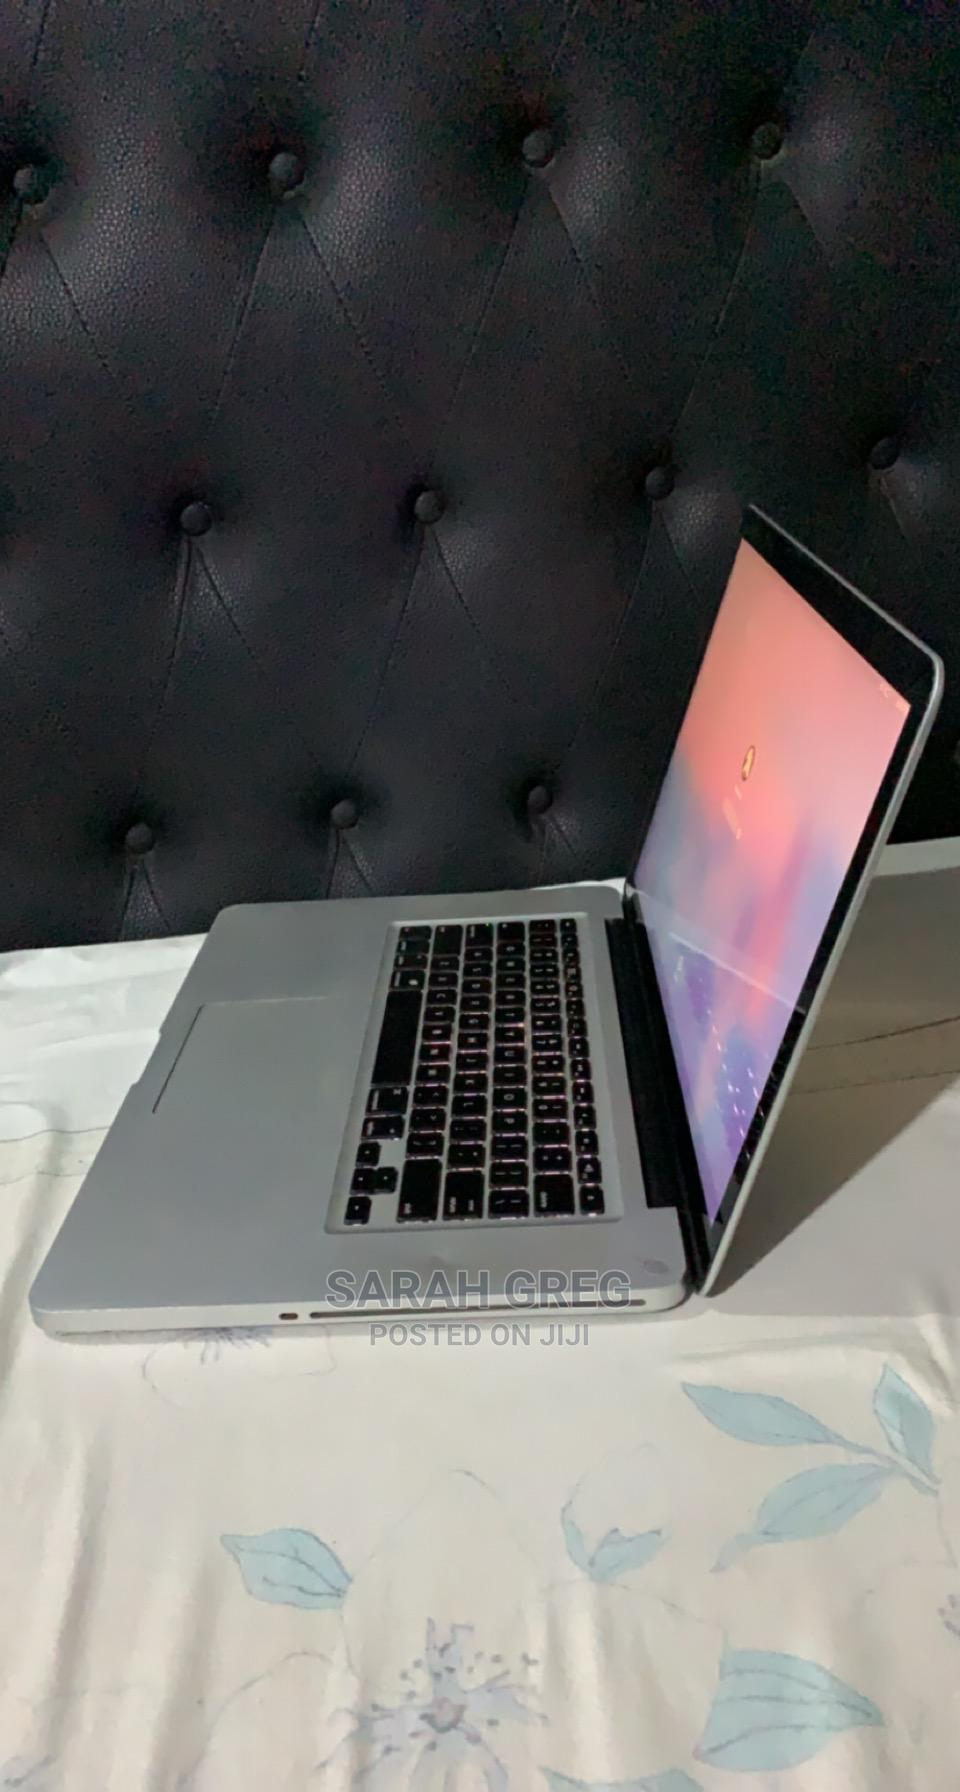 Archive: Laptop Apple MacBook Pro 2009 4GB Intel Core 2 Duo HDD 320GB